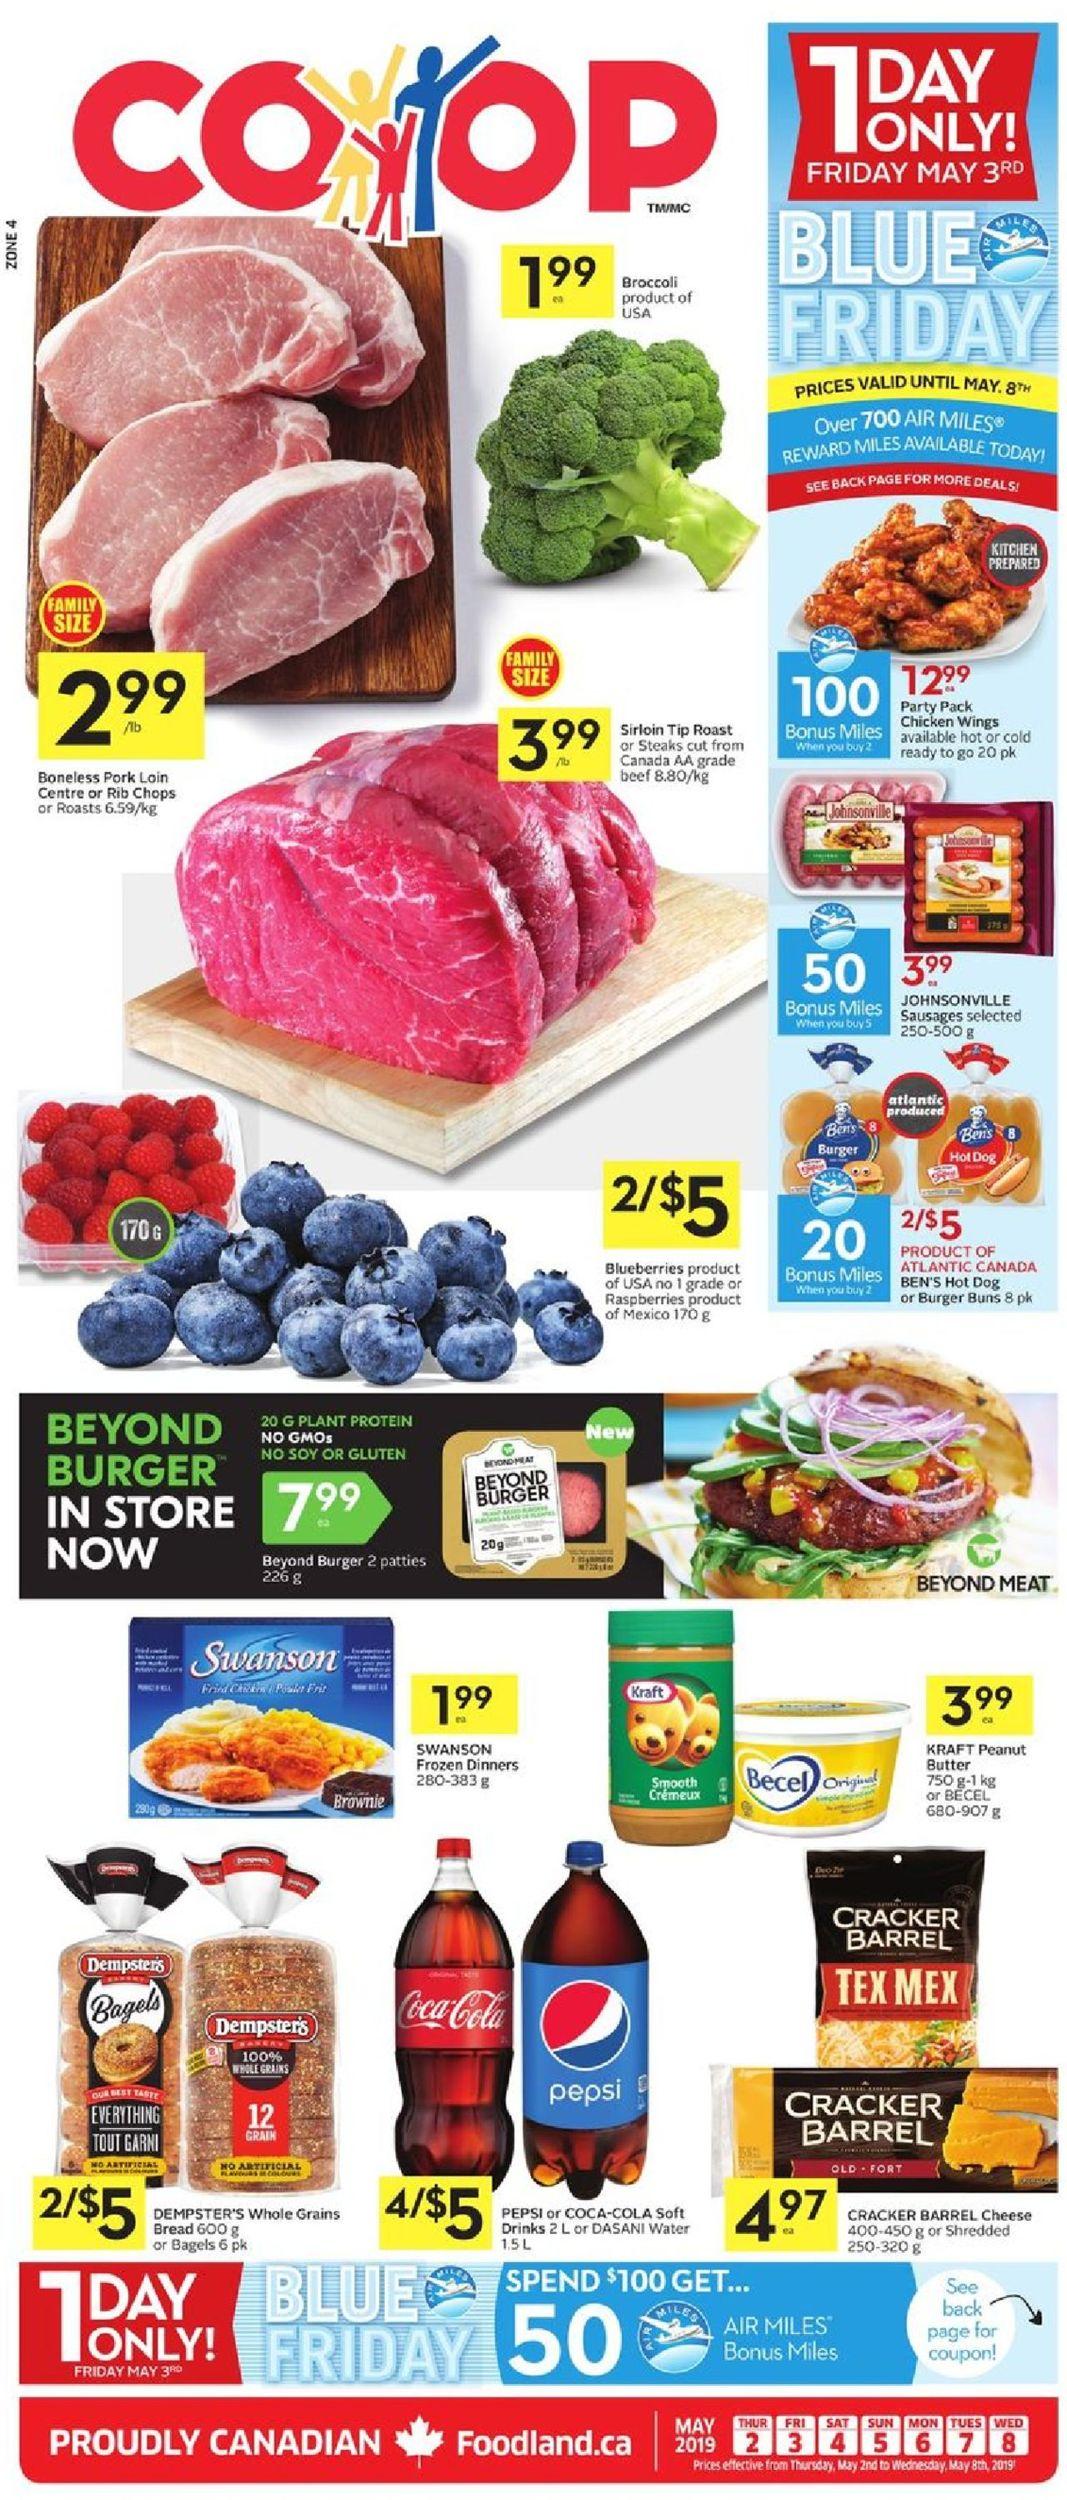 Foodland Flyer - 05/02-05/08/2019